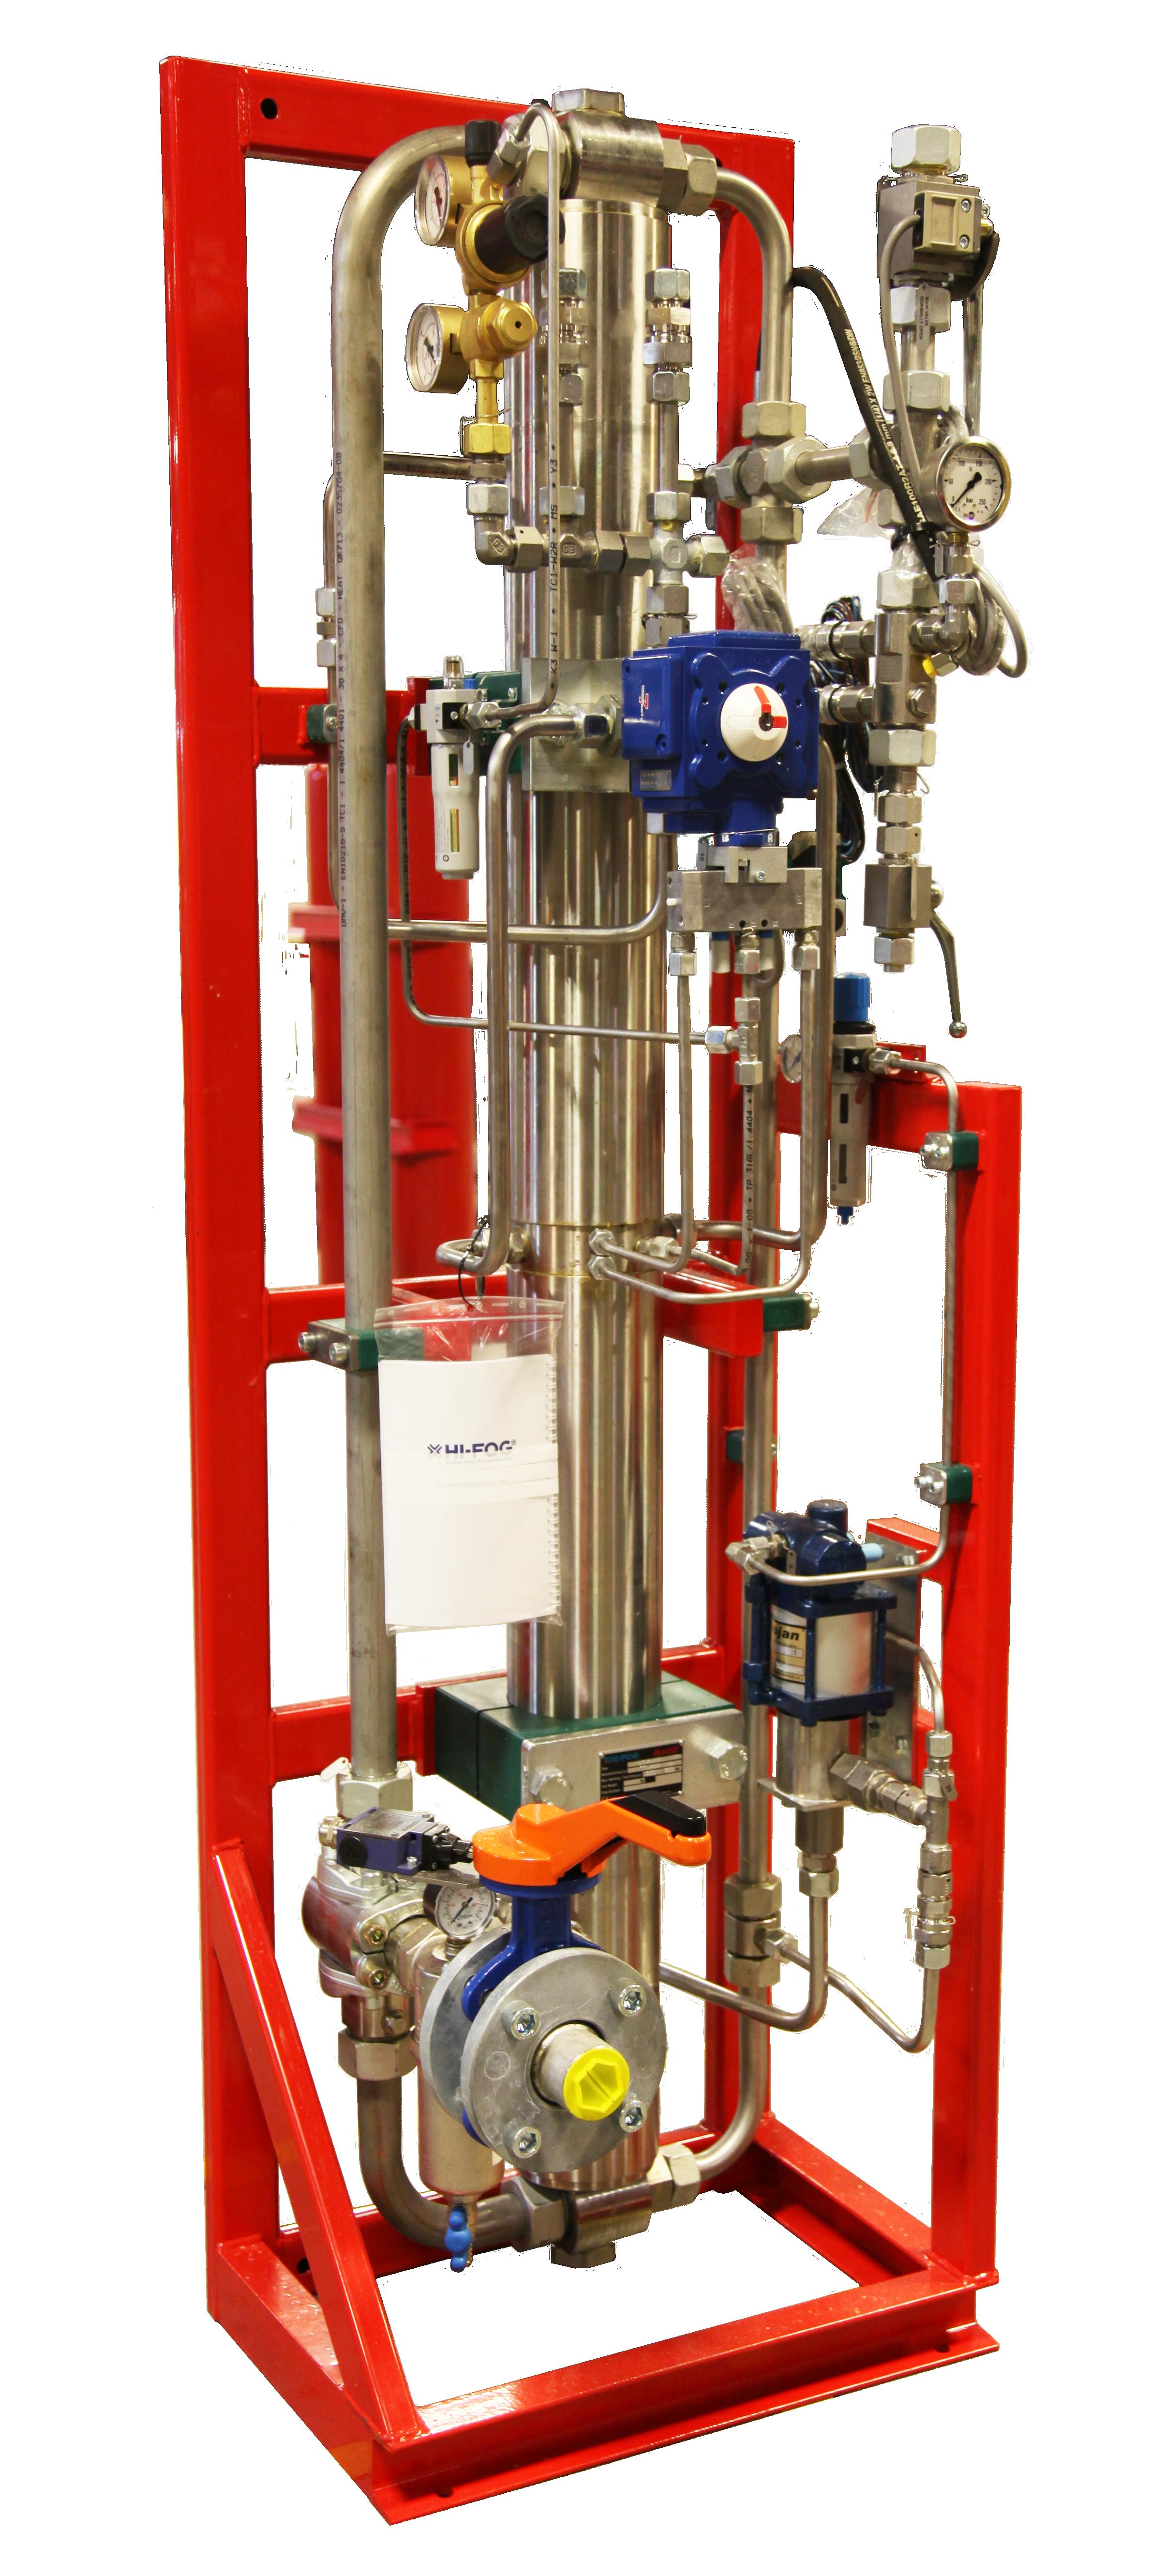 hi fog gas pump unit gpu kidde fire systems rh kidde fenwal com Honeywell Thermostat Installation Manual Vinyl Graphics Installation Guide